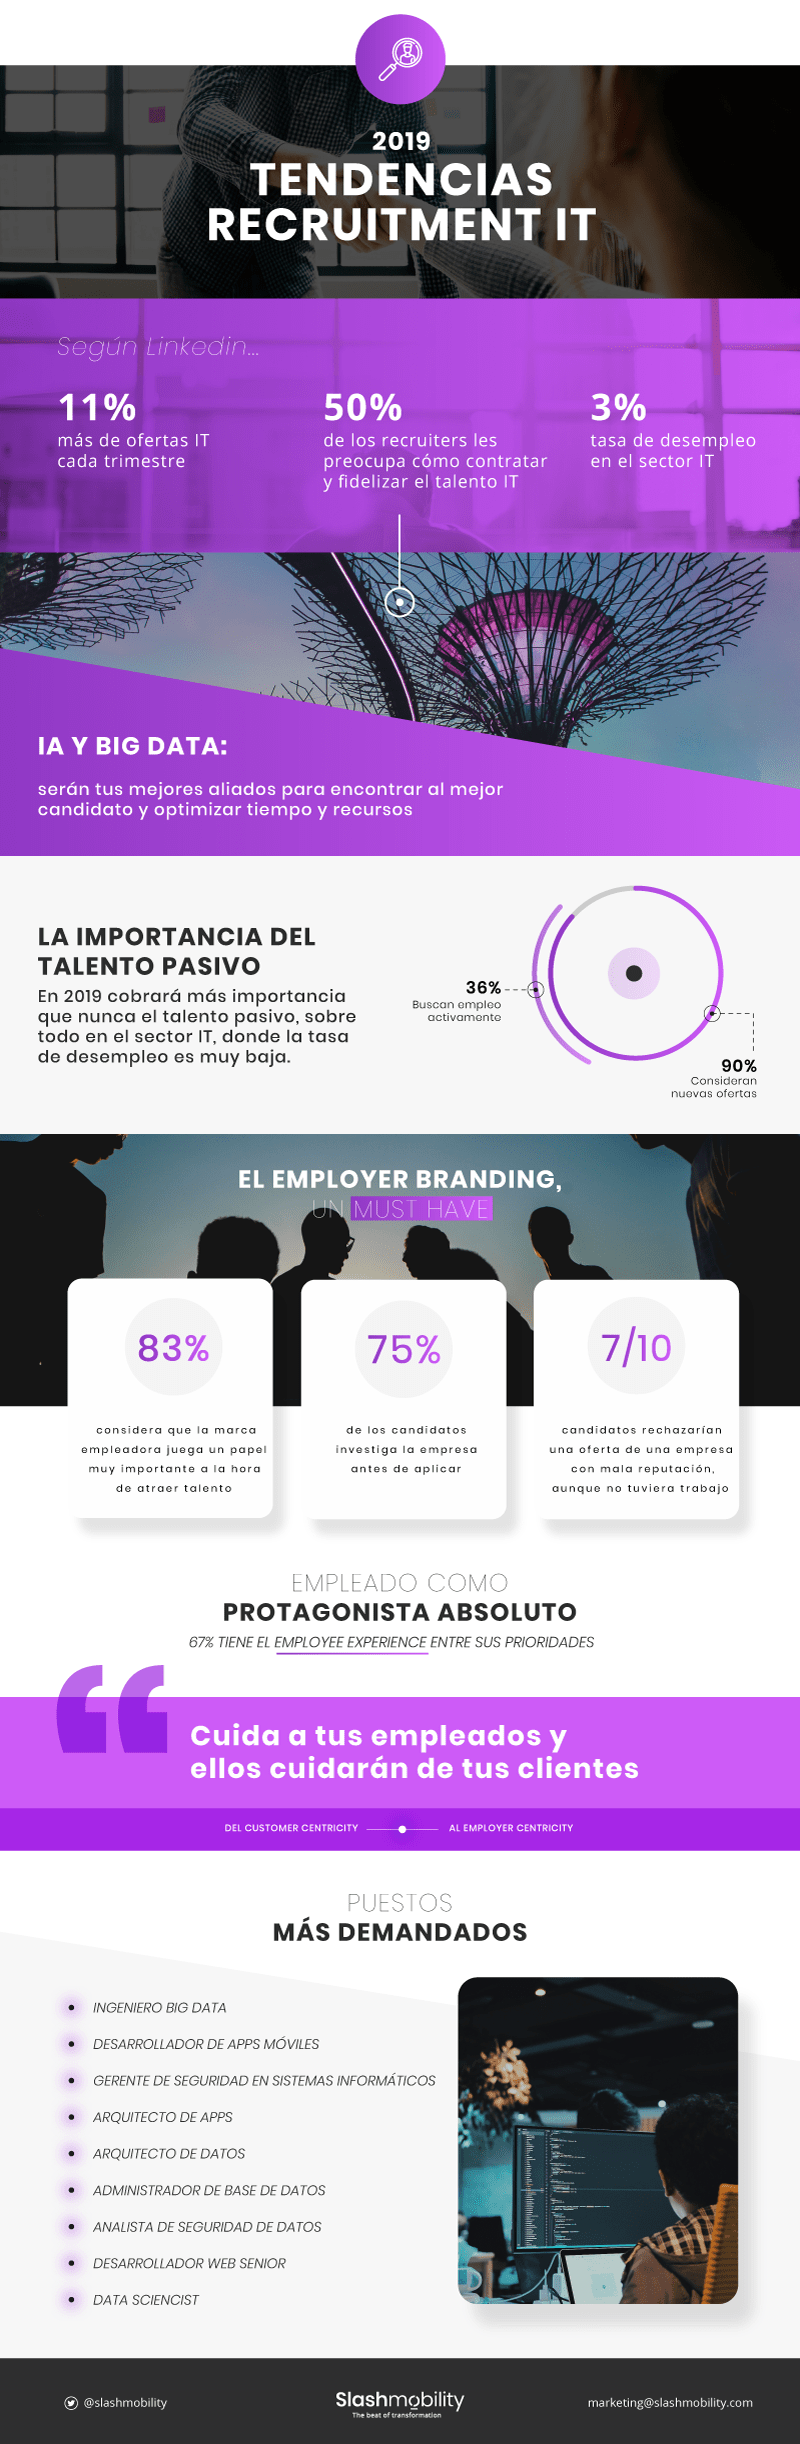 Tendencias en reclutamiento IT #infografia #infographic #rrhh